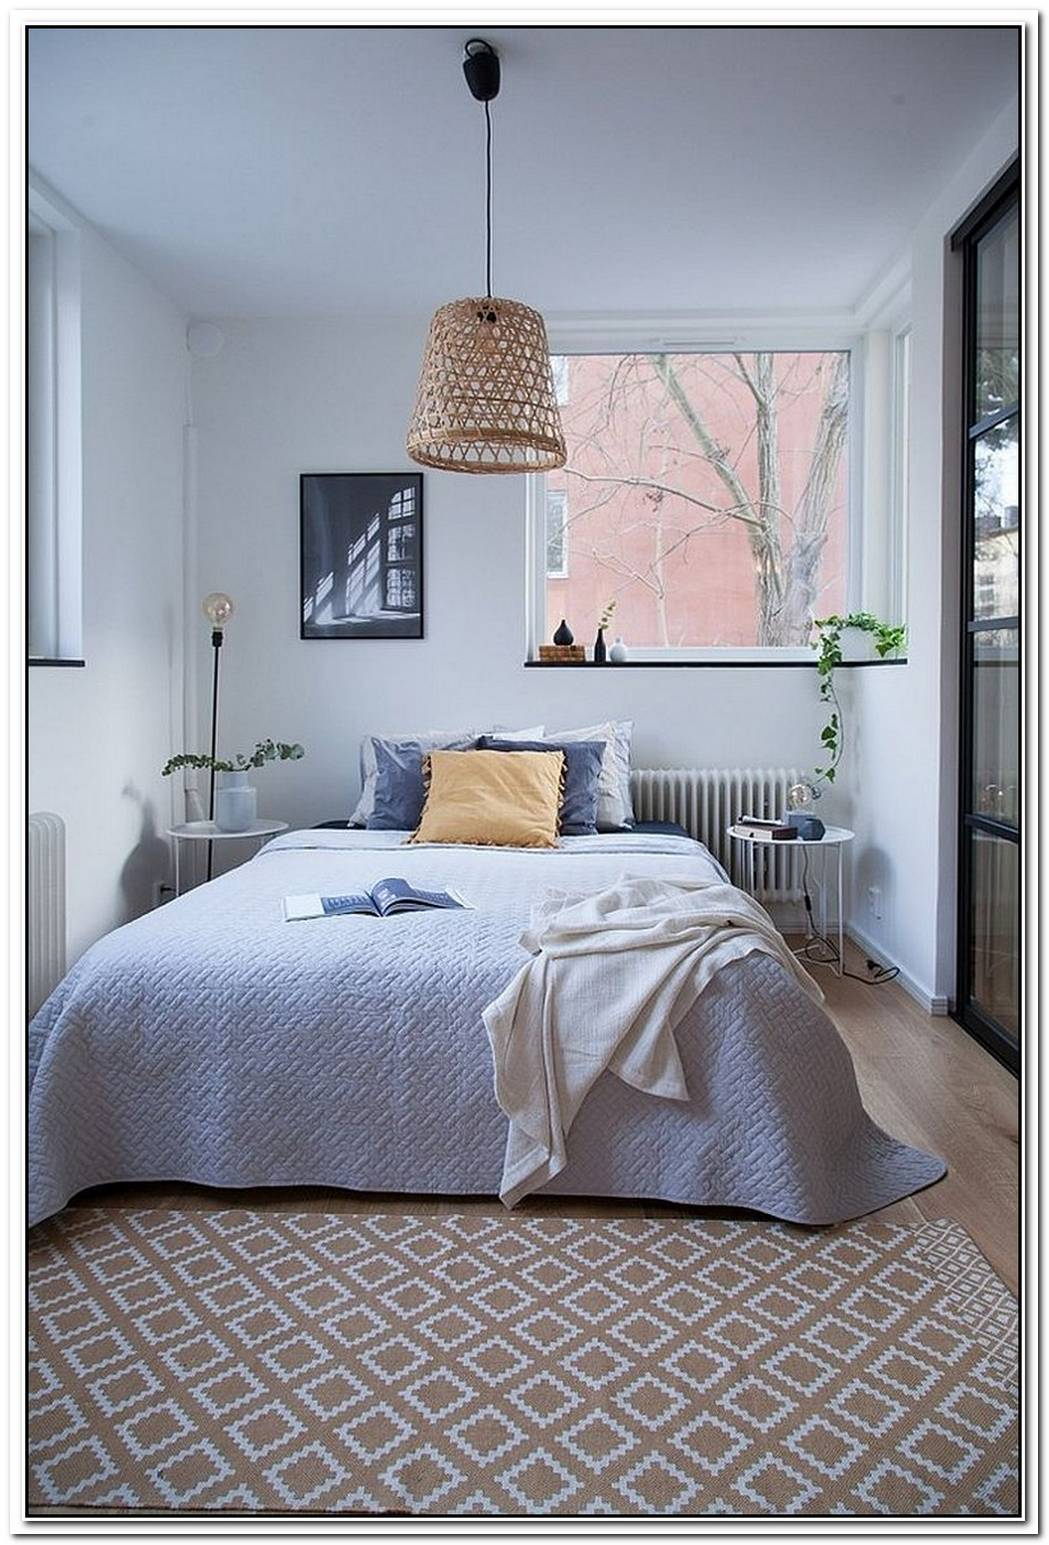 Spring 2018 Bedroom Decorating TrendsSereneGreen And Sparkly